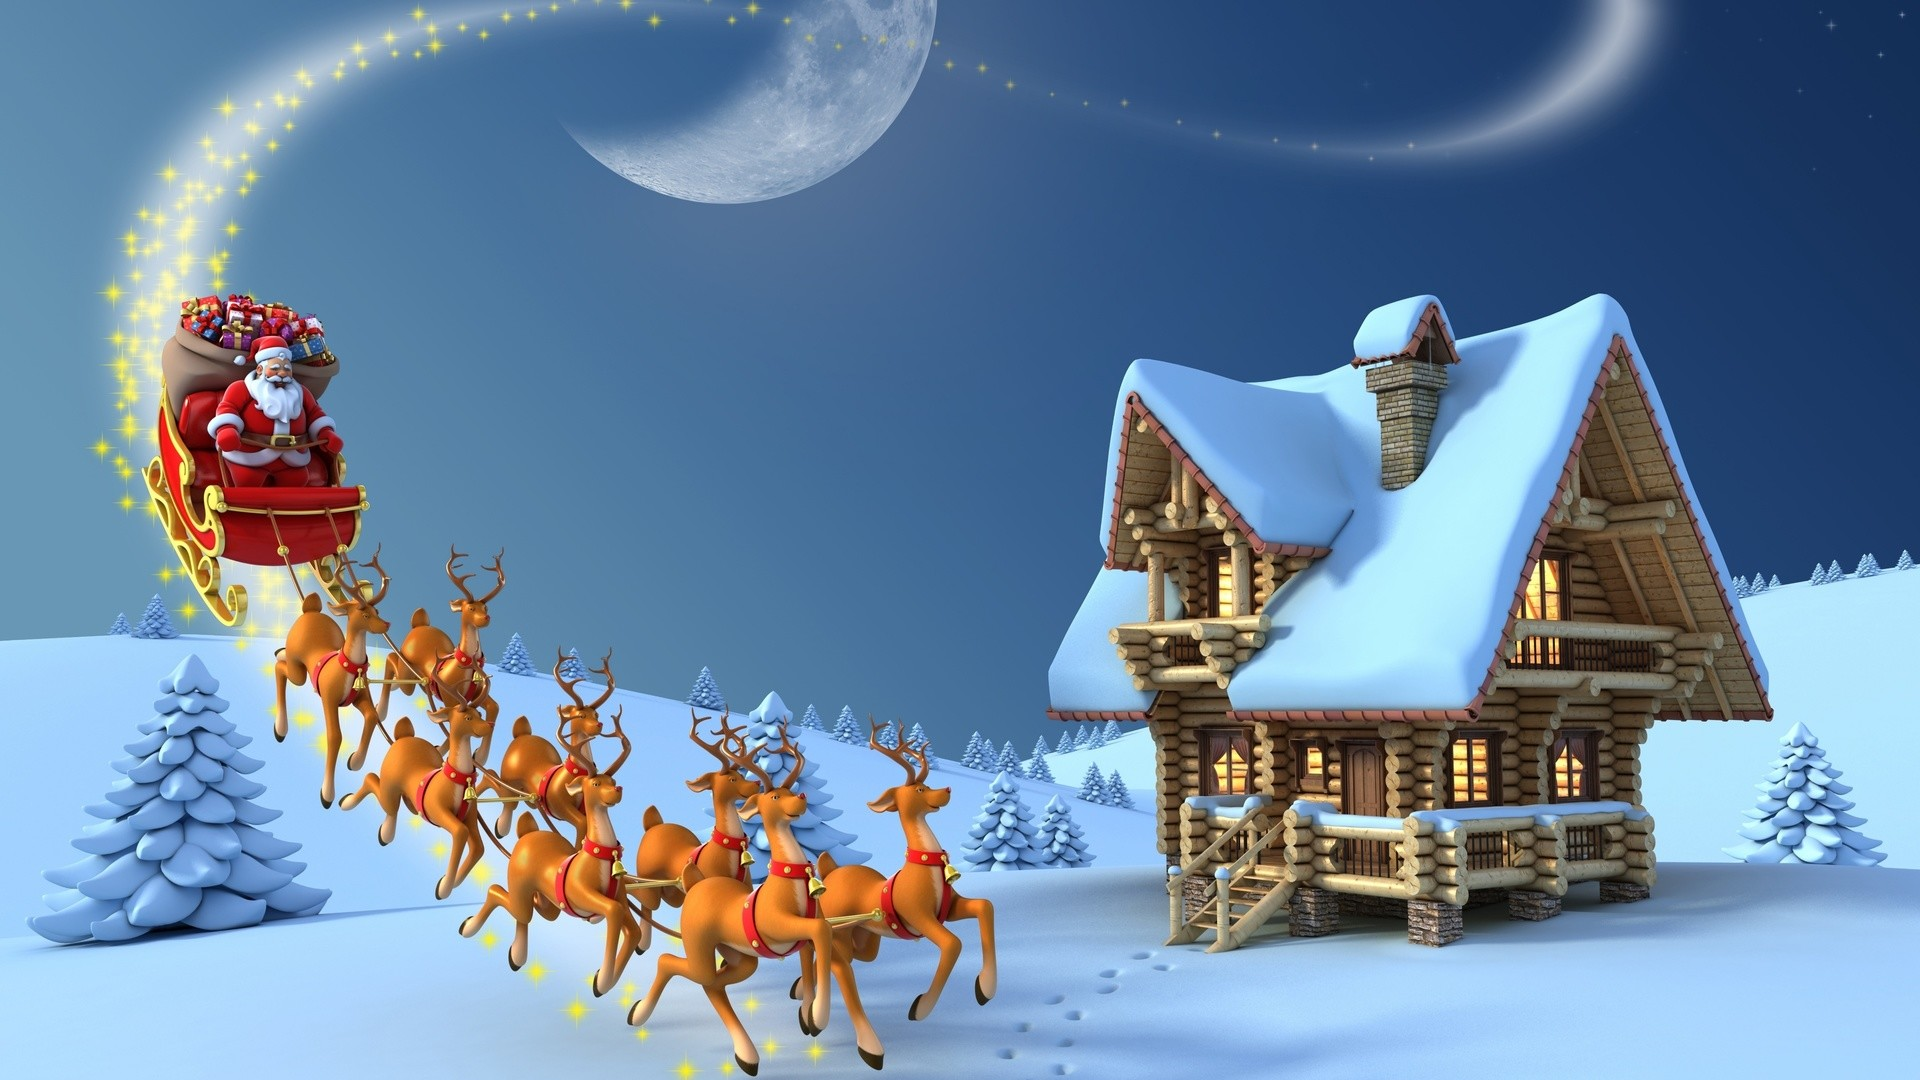 Res: 1920x1080, 1024x768; Christmas Wallpaper